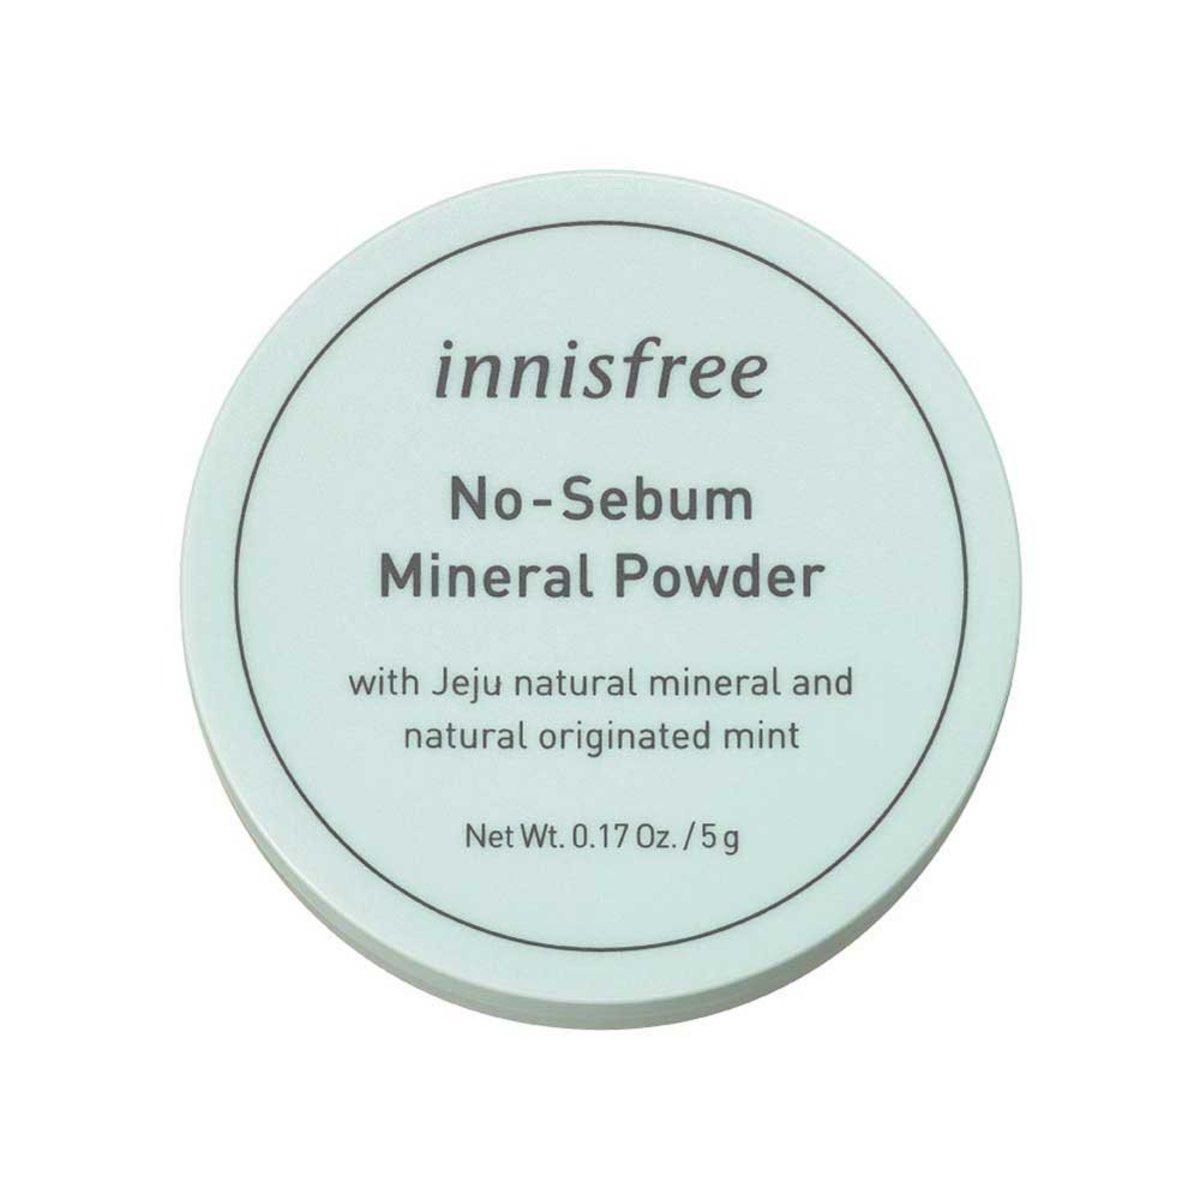 No Sebum Mineral Powder 5g